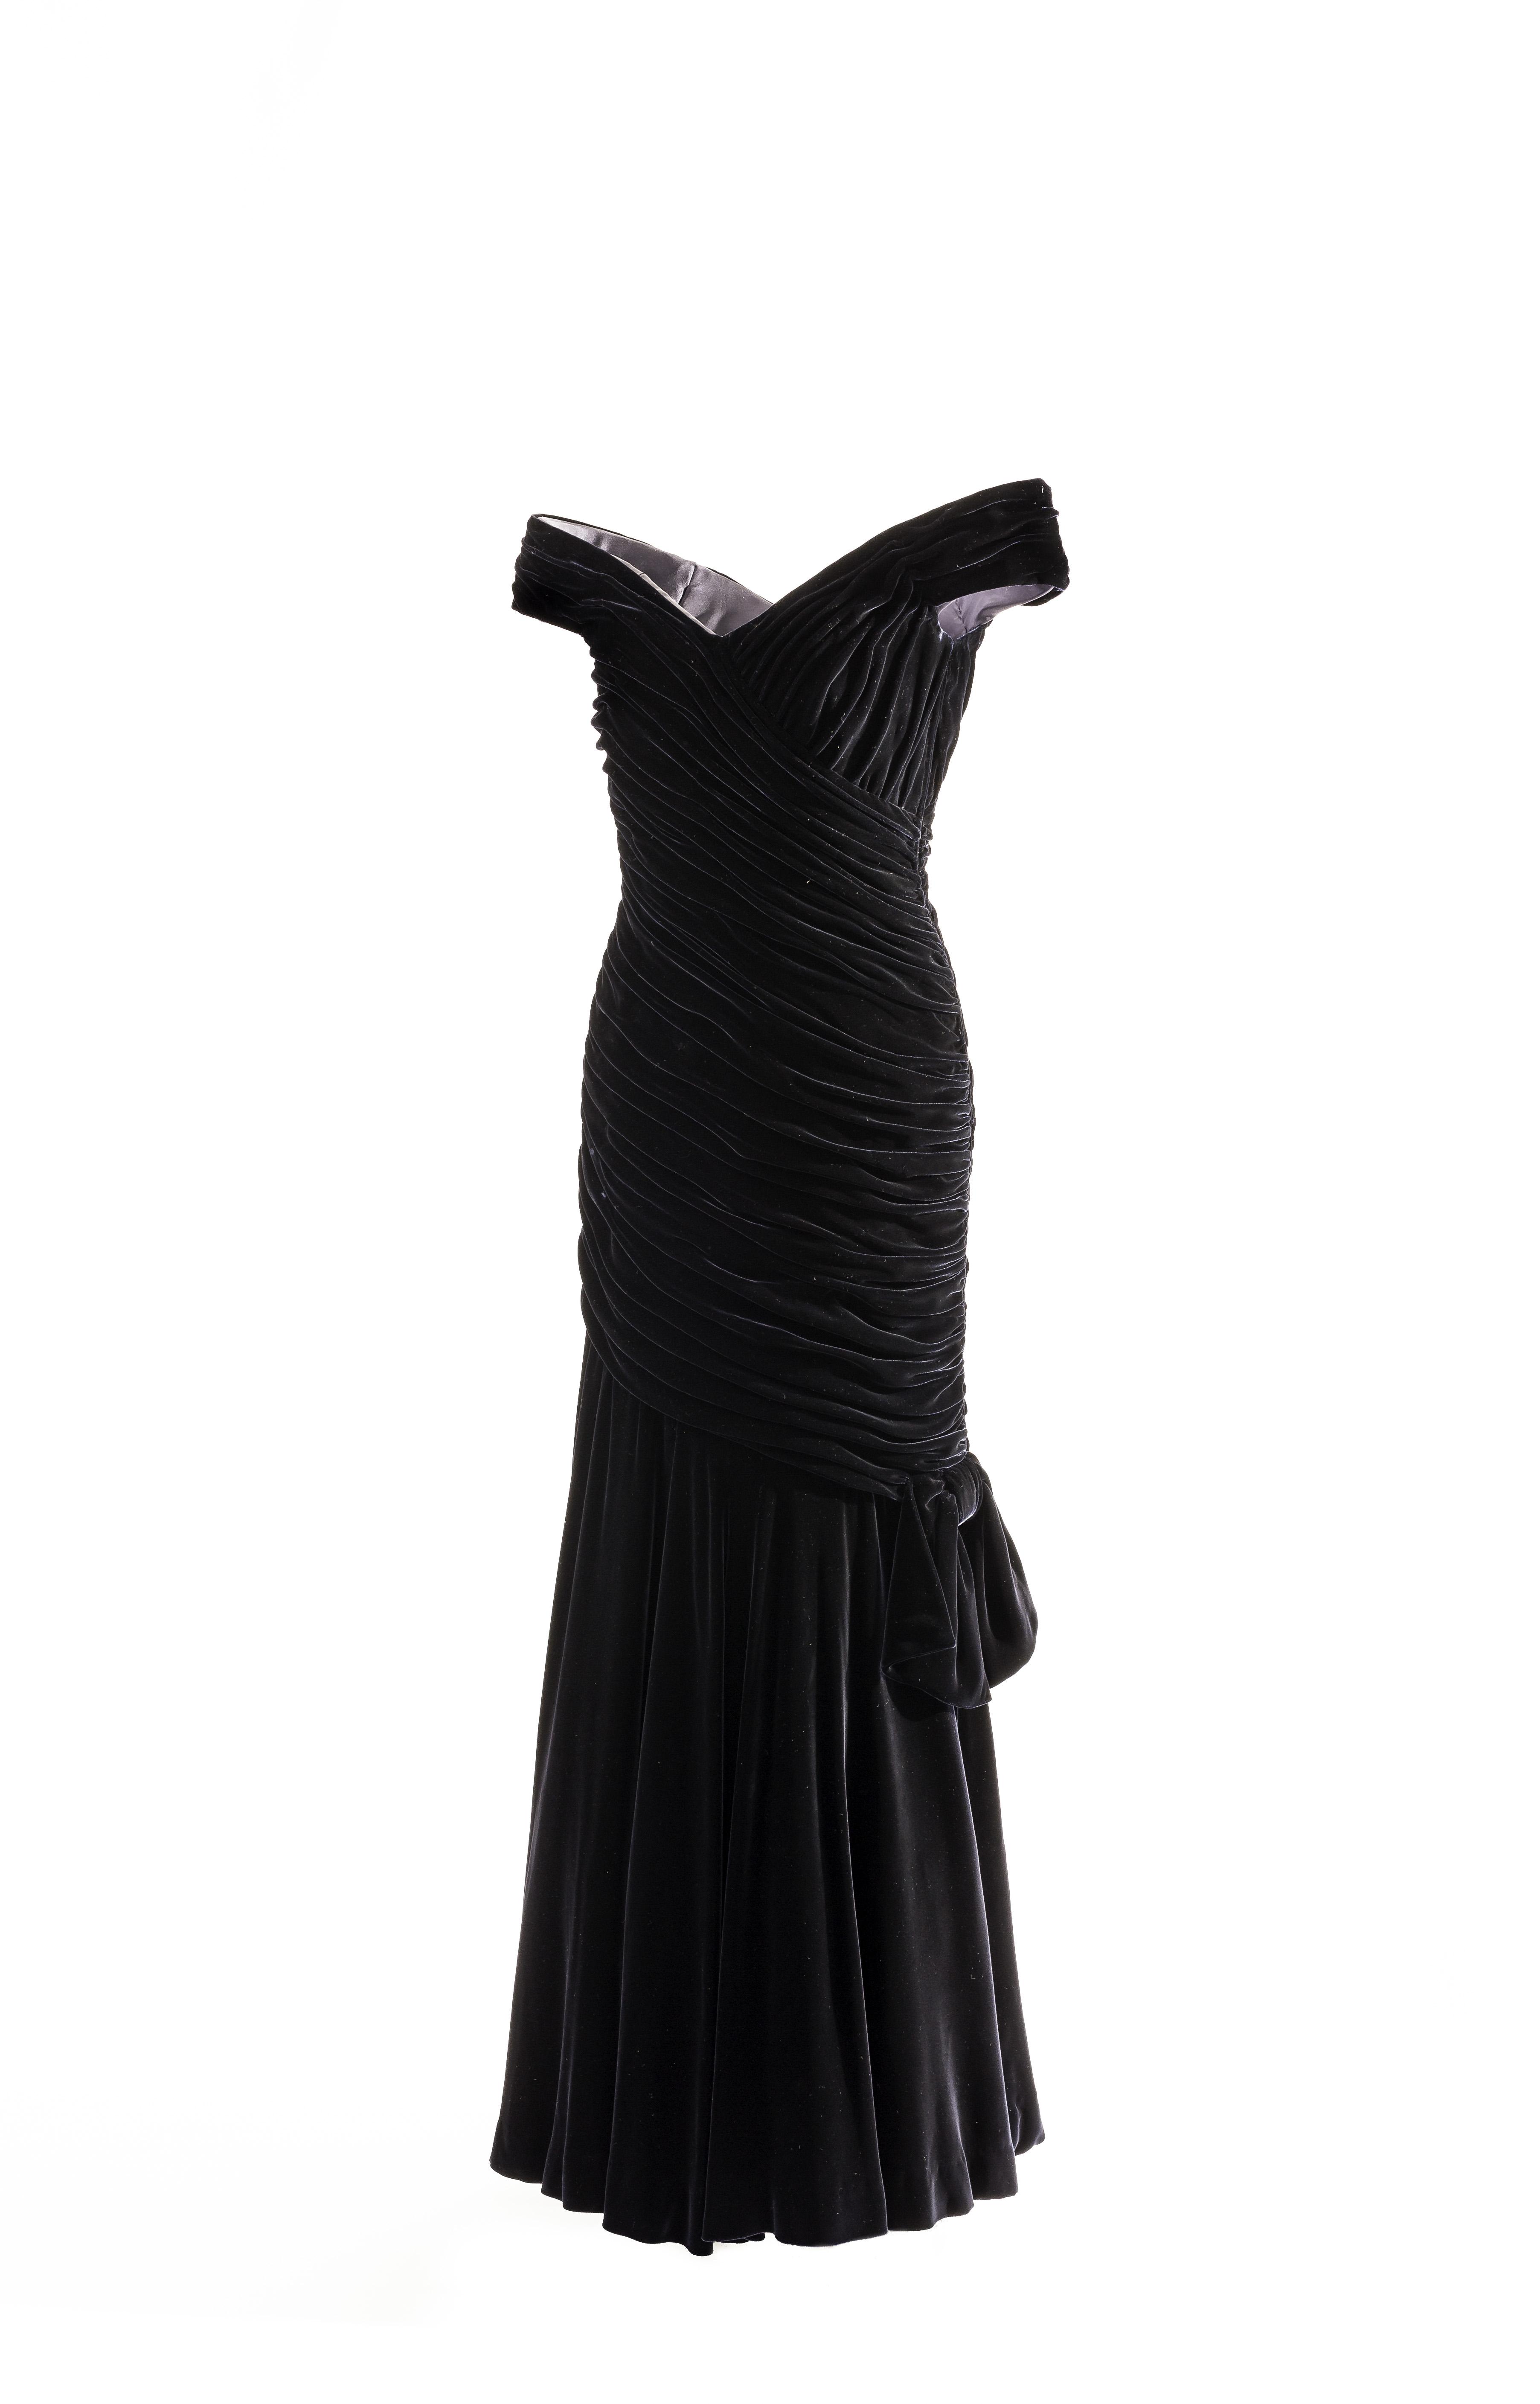 Victor Edelstein, 'Travolta' dress, © Historic Royal Palaces, Newsteam